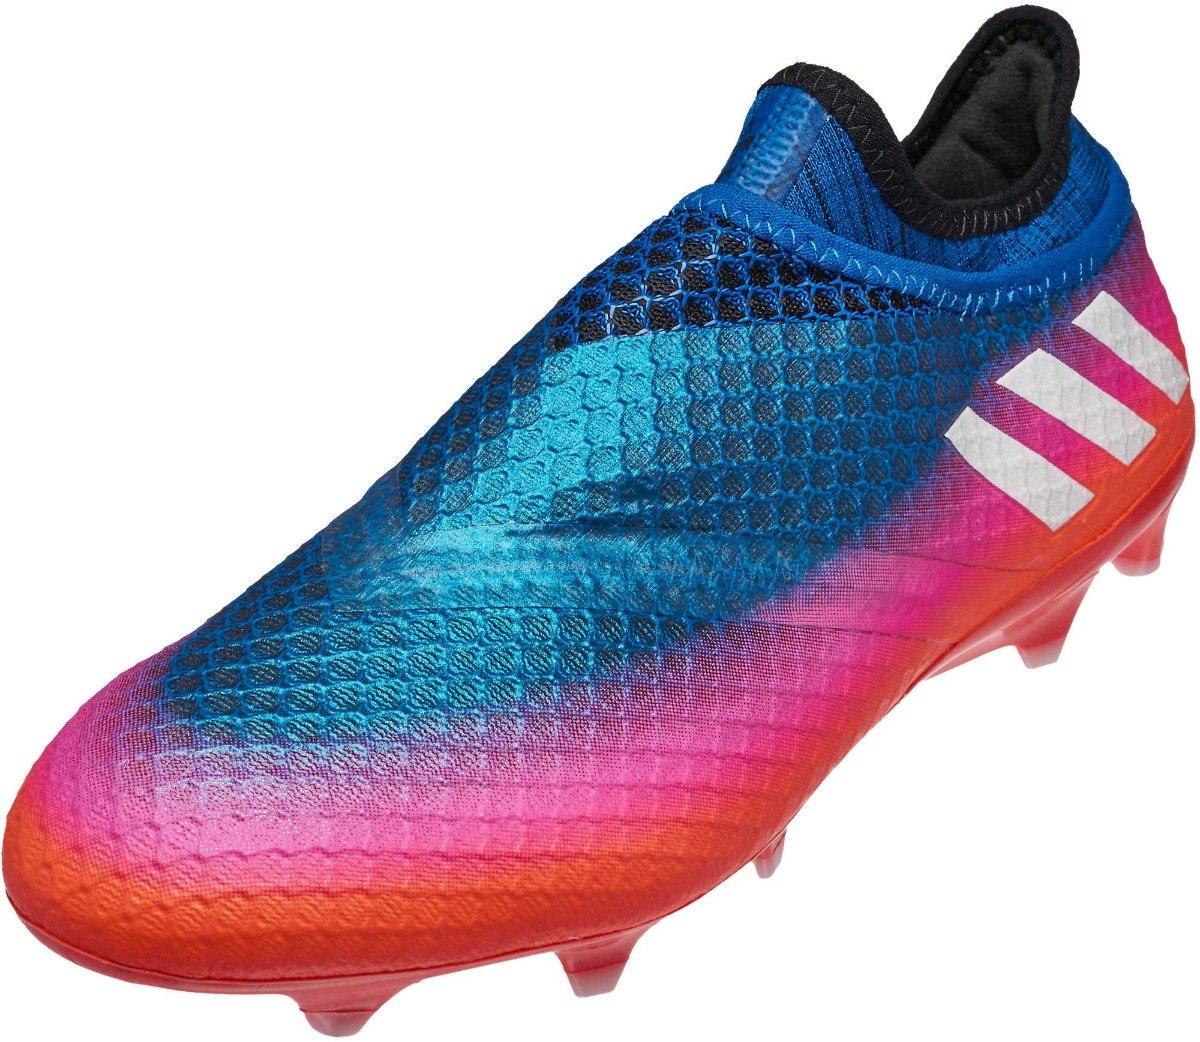 Botin adidas Messi 16+pureagility Futbol Profesional Nª2